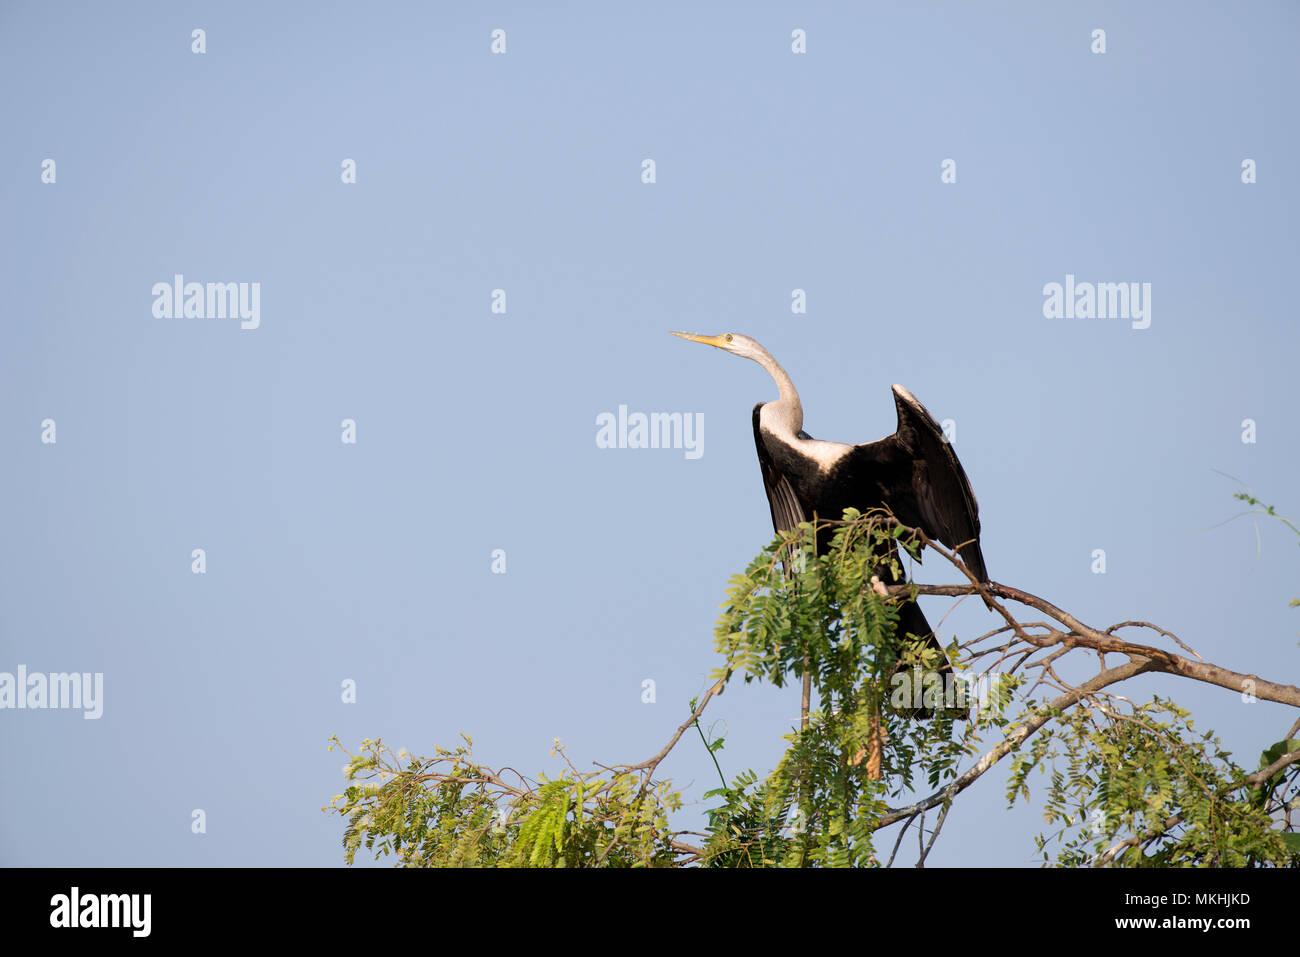 Oriental darter (Anhinga melanogaster) on a branch, Thailand - Stock Image